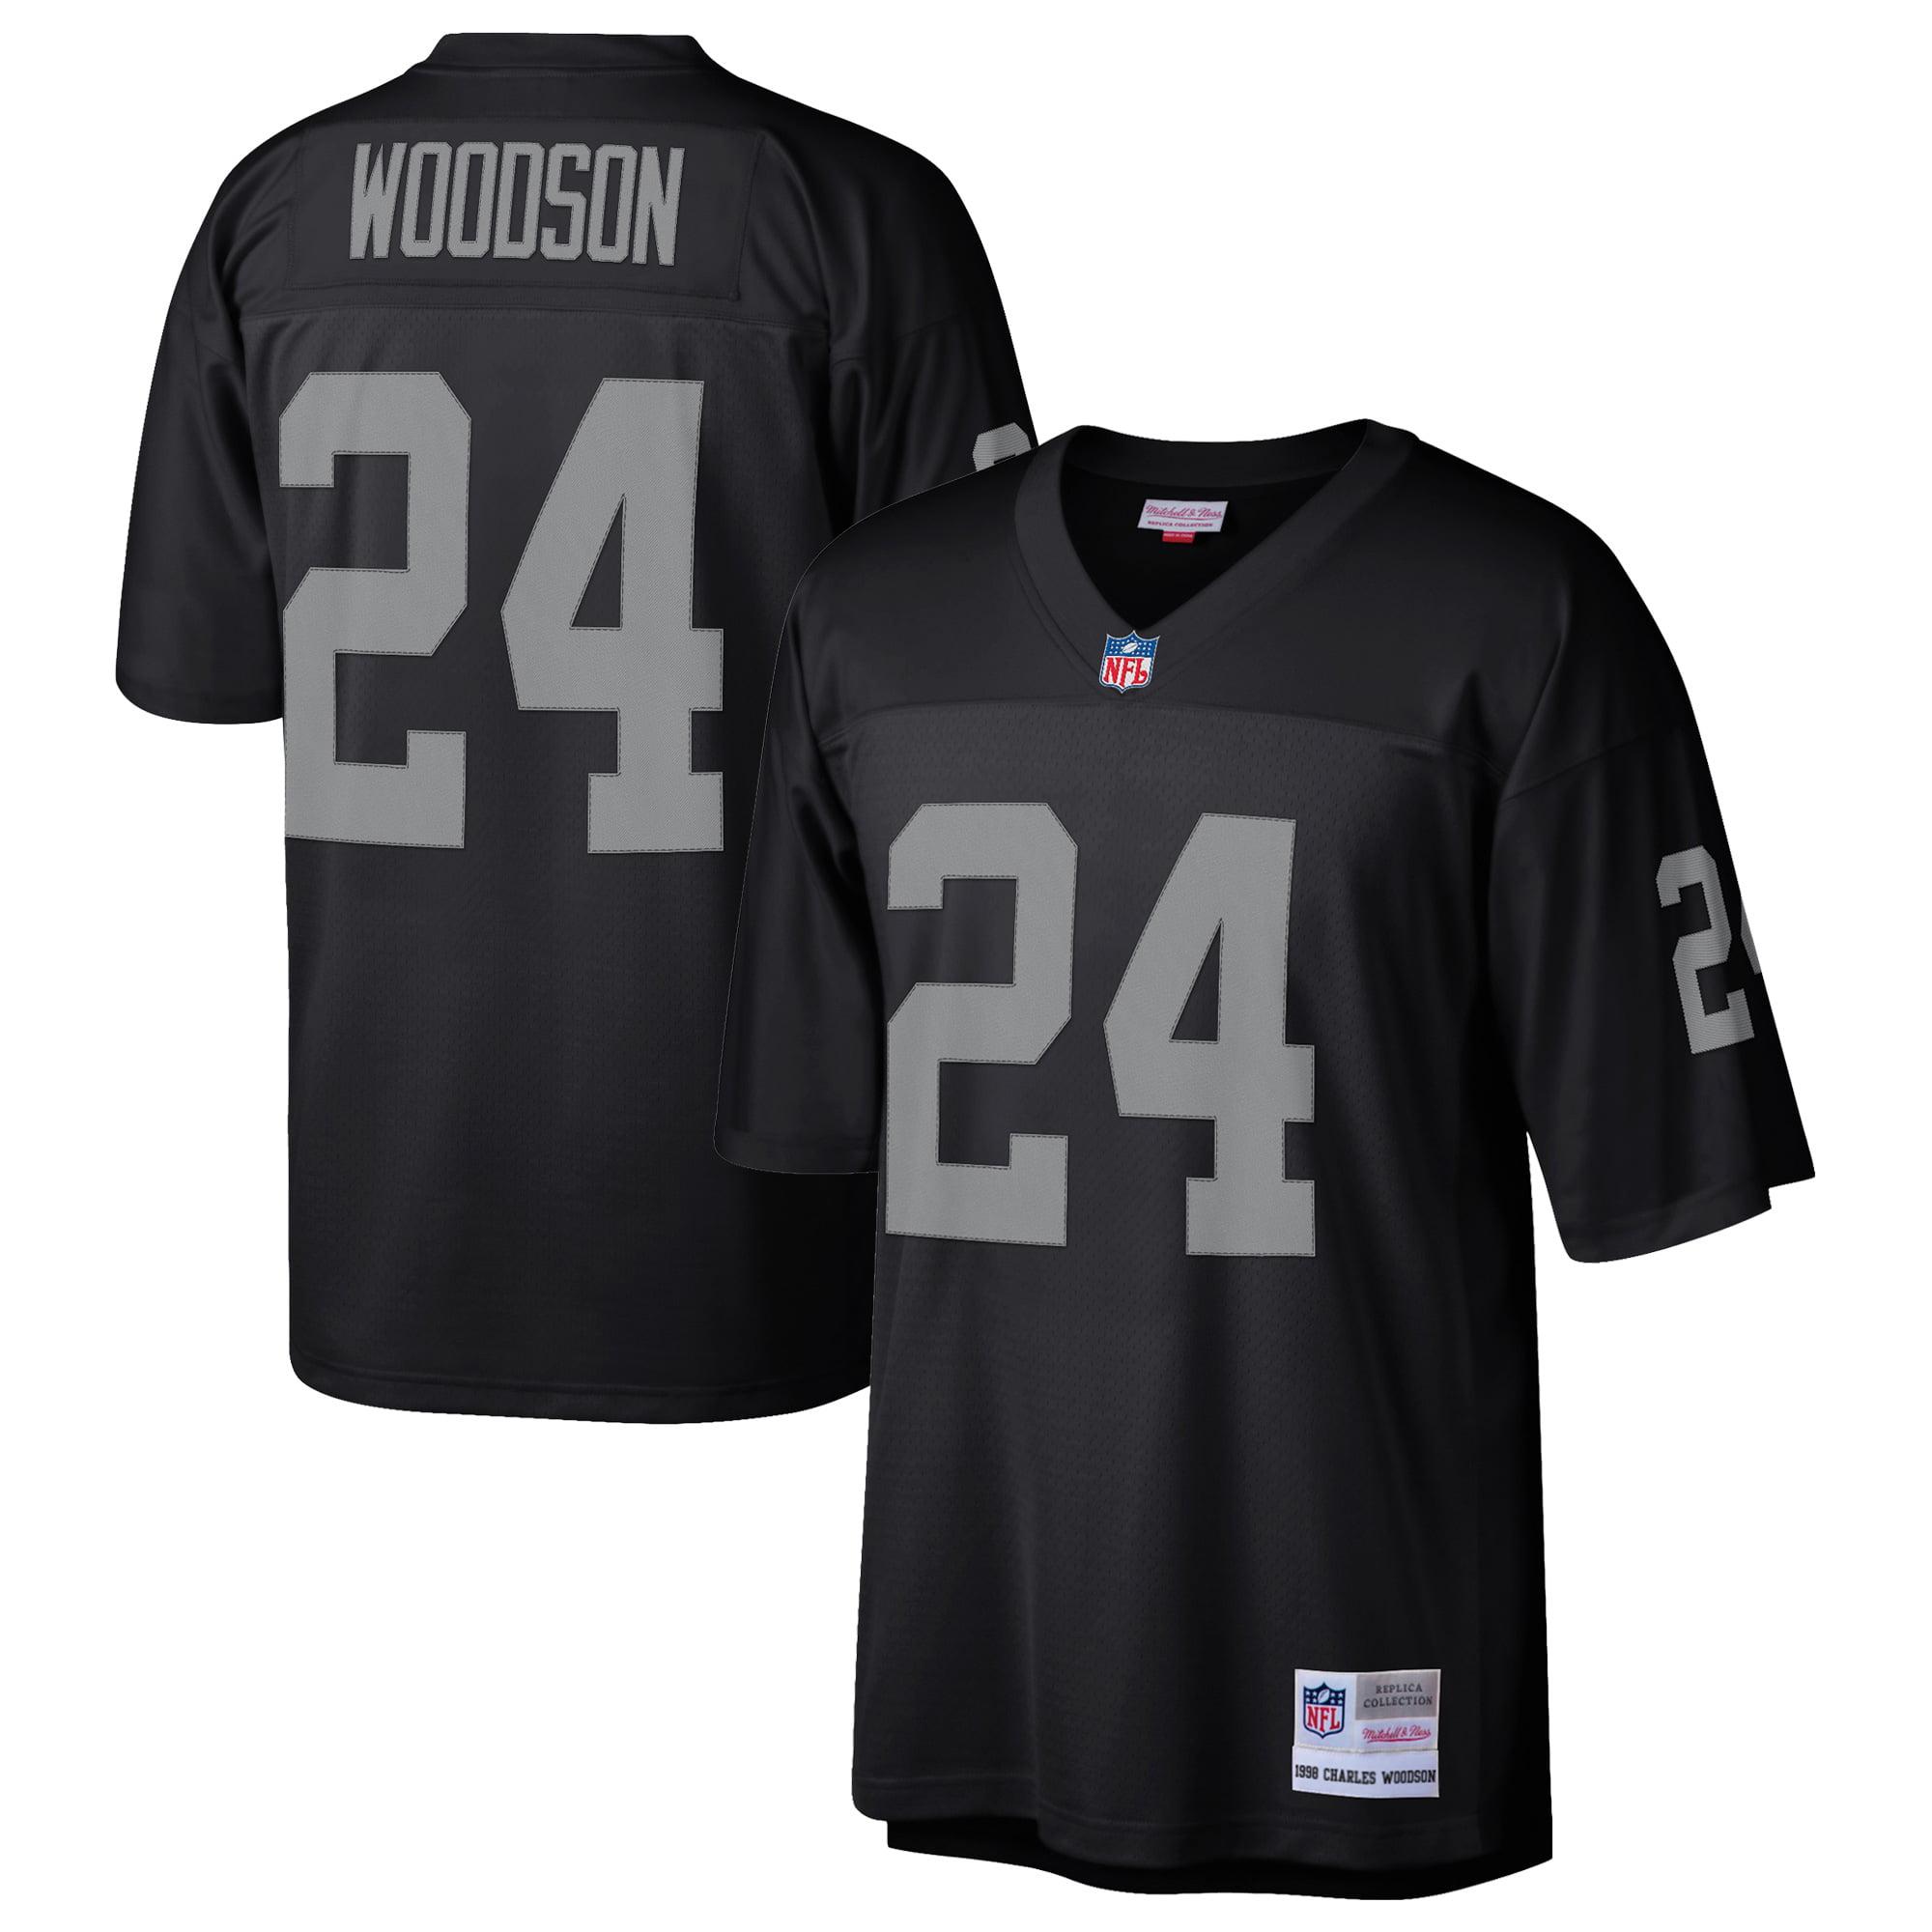 Charles Woodson Oakland Raiders Mitchell & Ness Retired Player Replica Jersey - Black